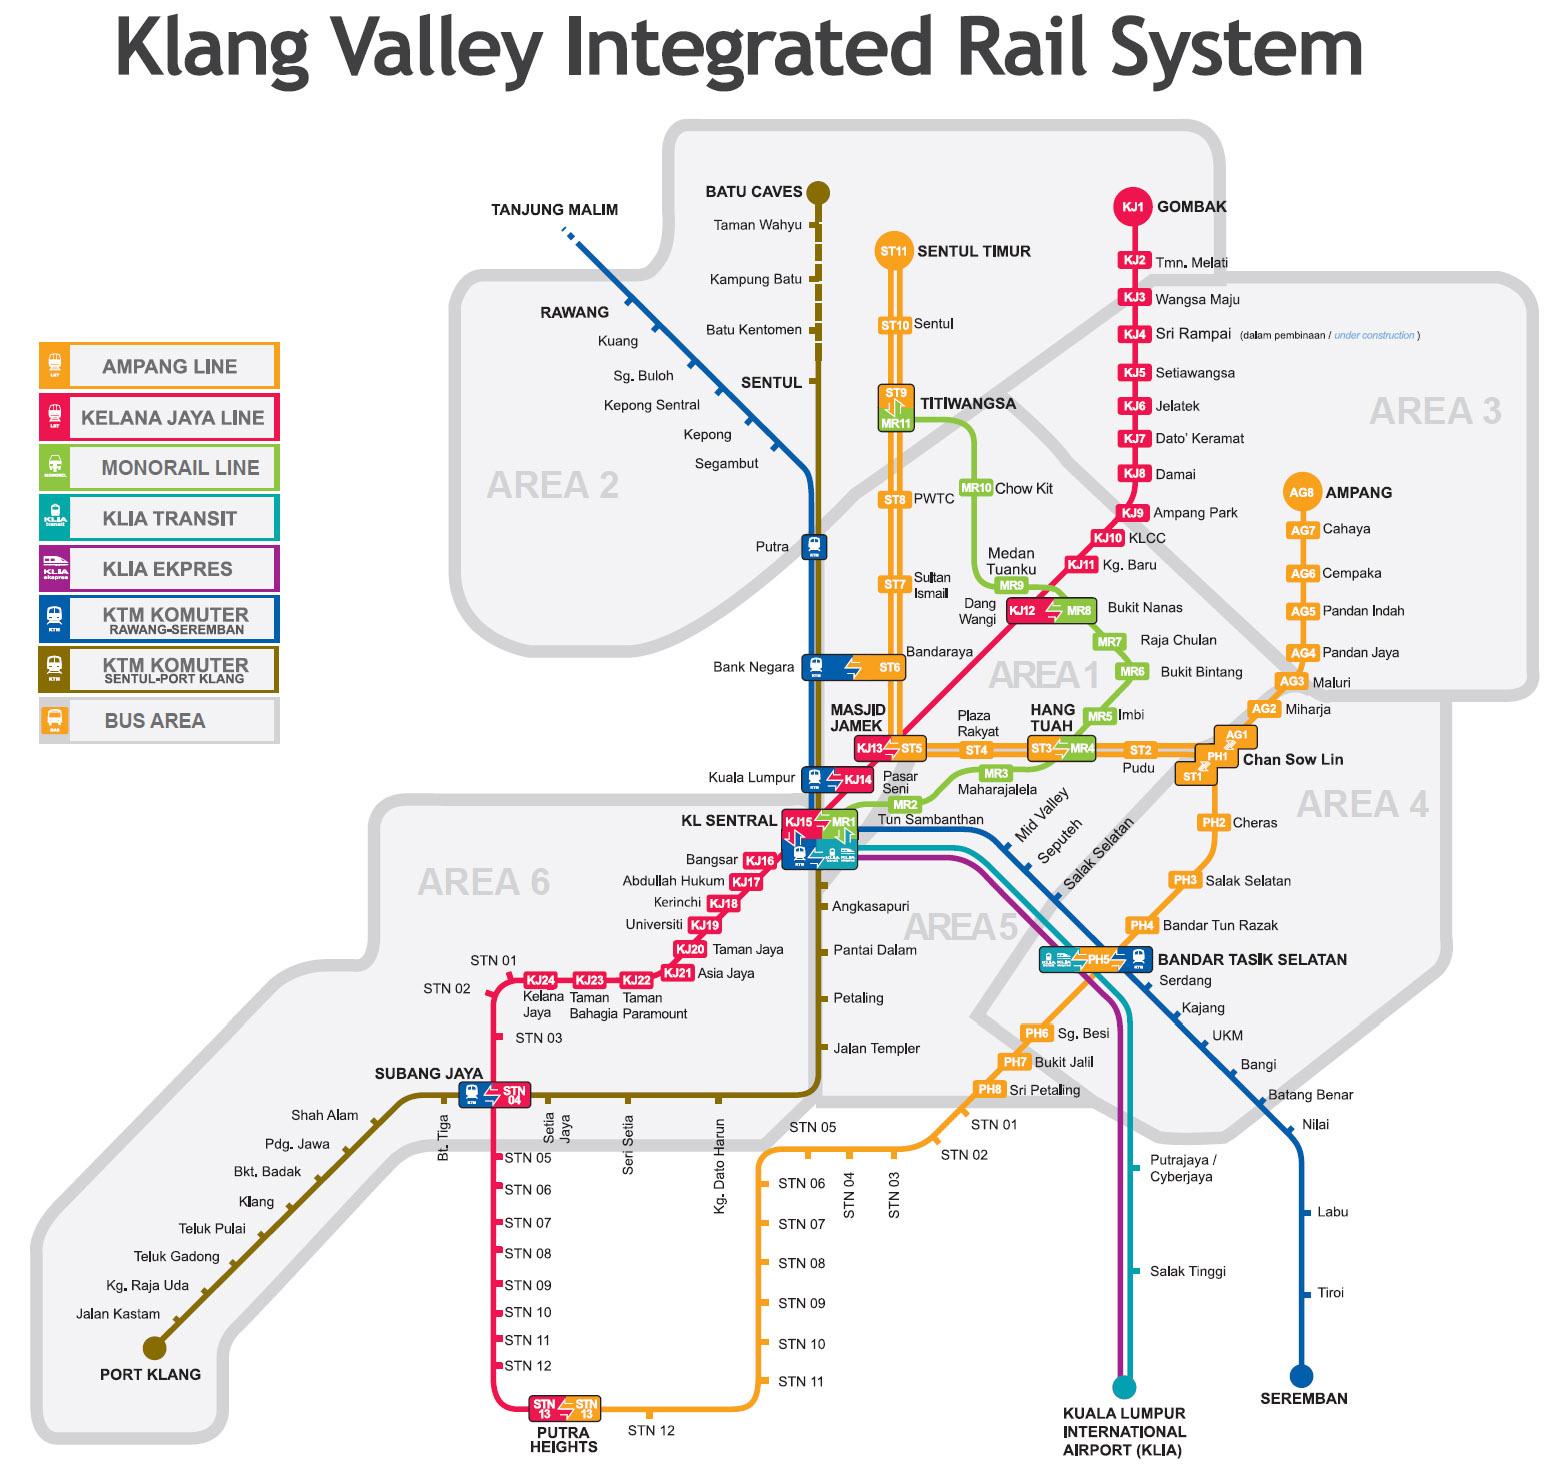 Lumpur LRT and Monorail Map